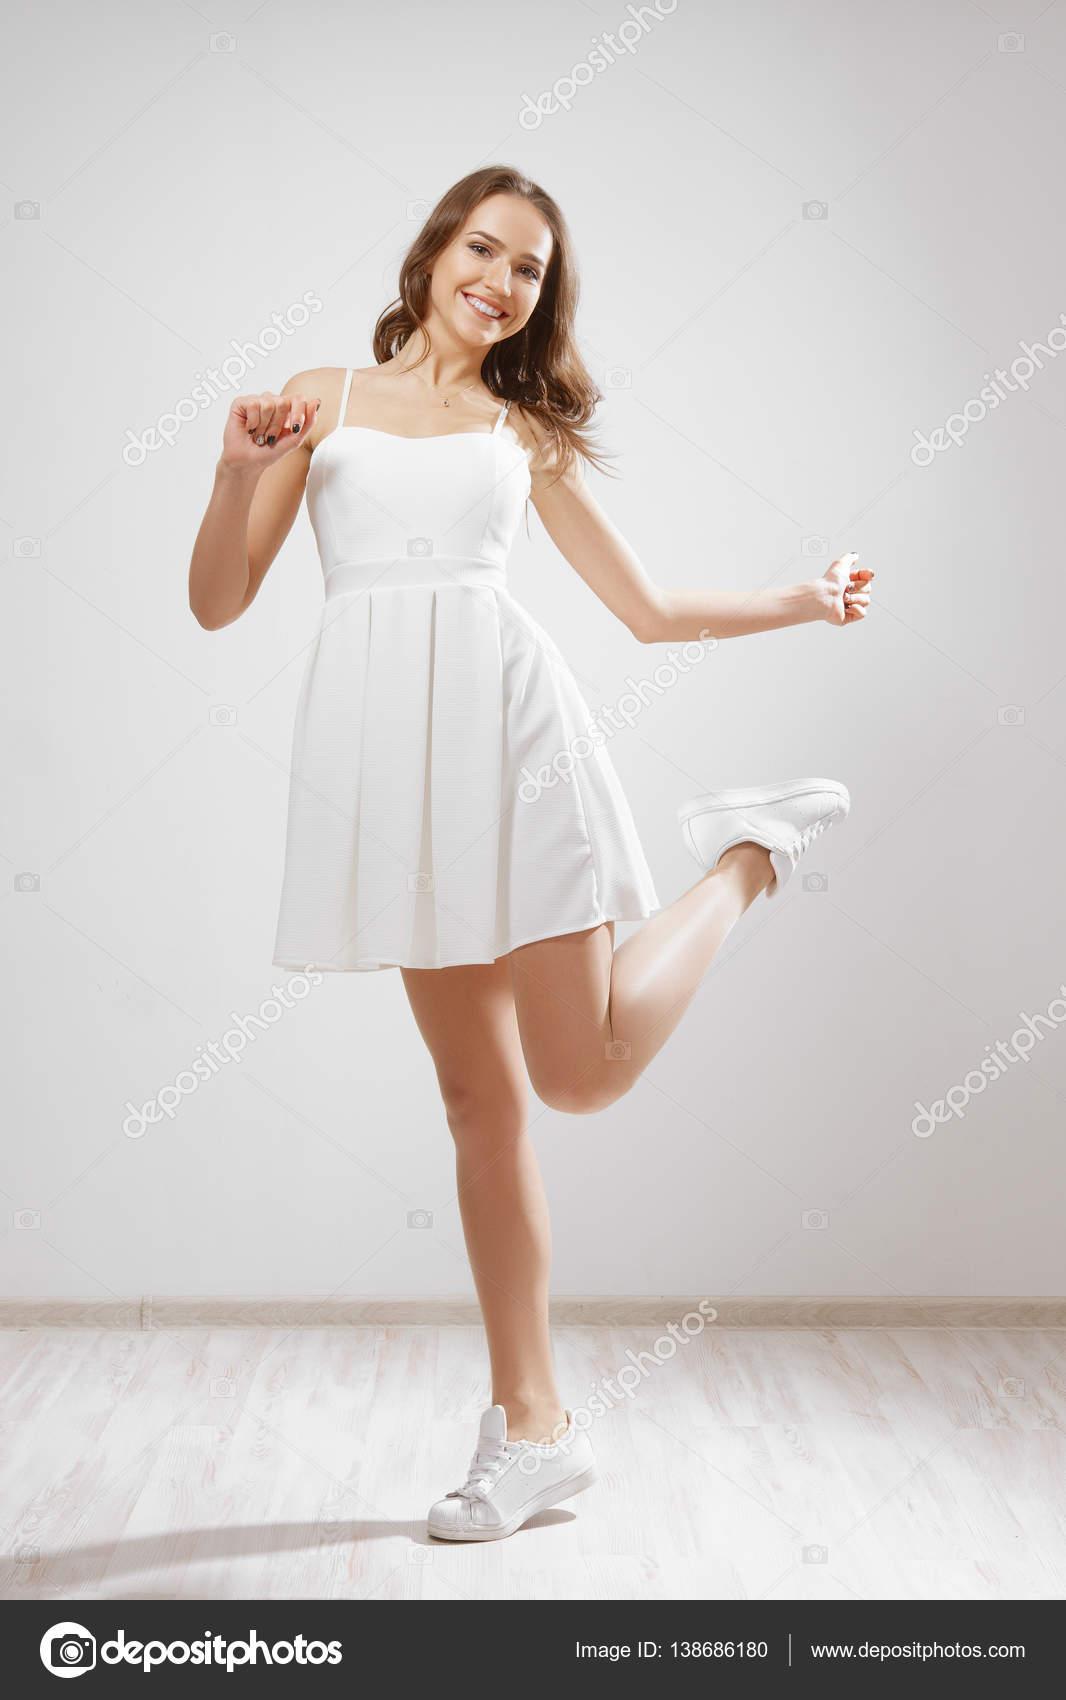 9e8ef0ee367d Όμορφη νεαρή κοπέλα με λευκό κοντό φόρεμα